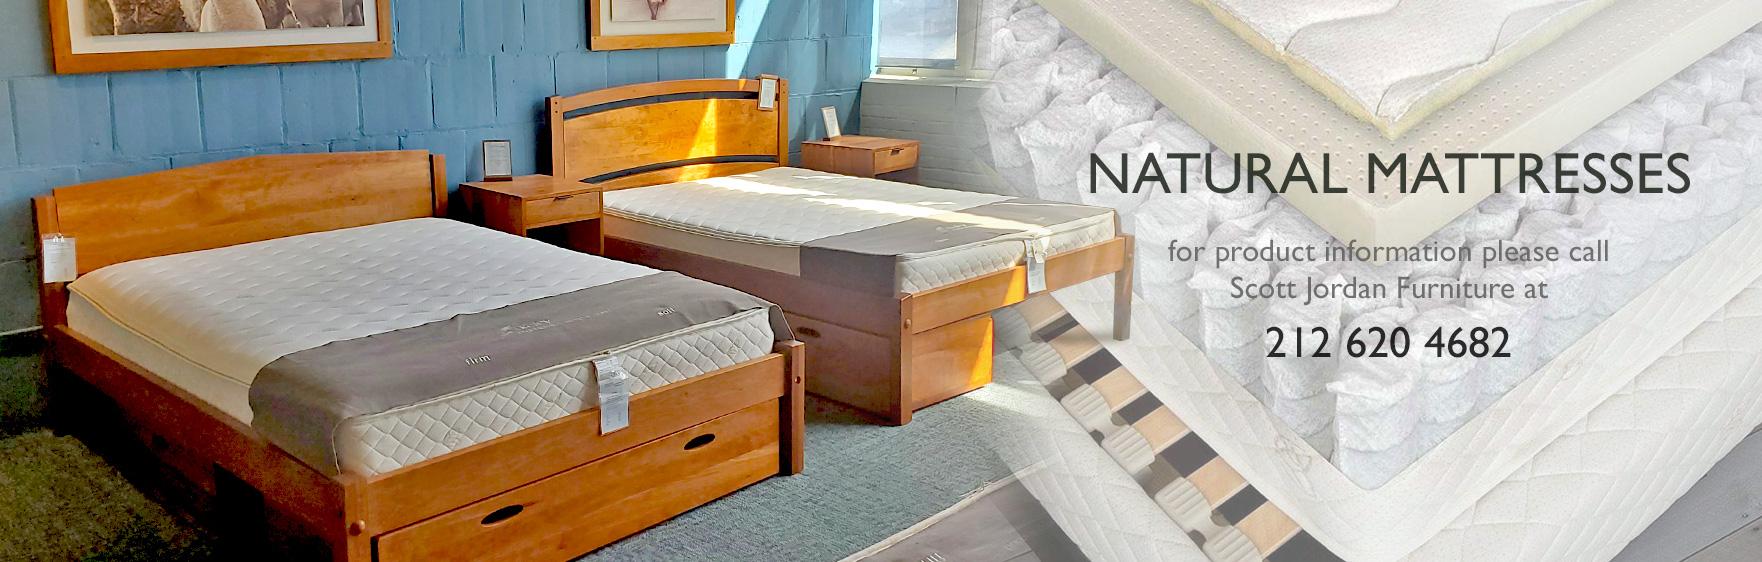 Natural Mattresses Scott Jordan Furniture